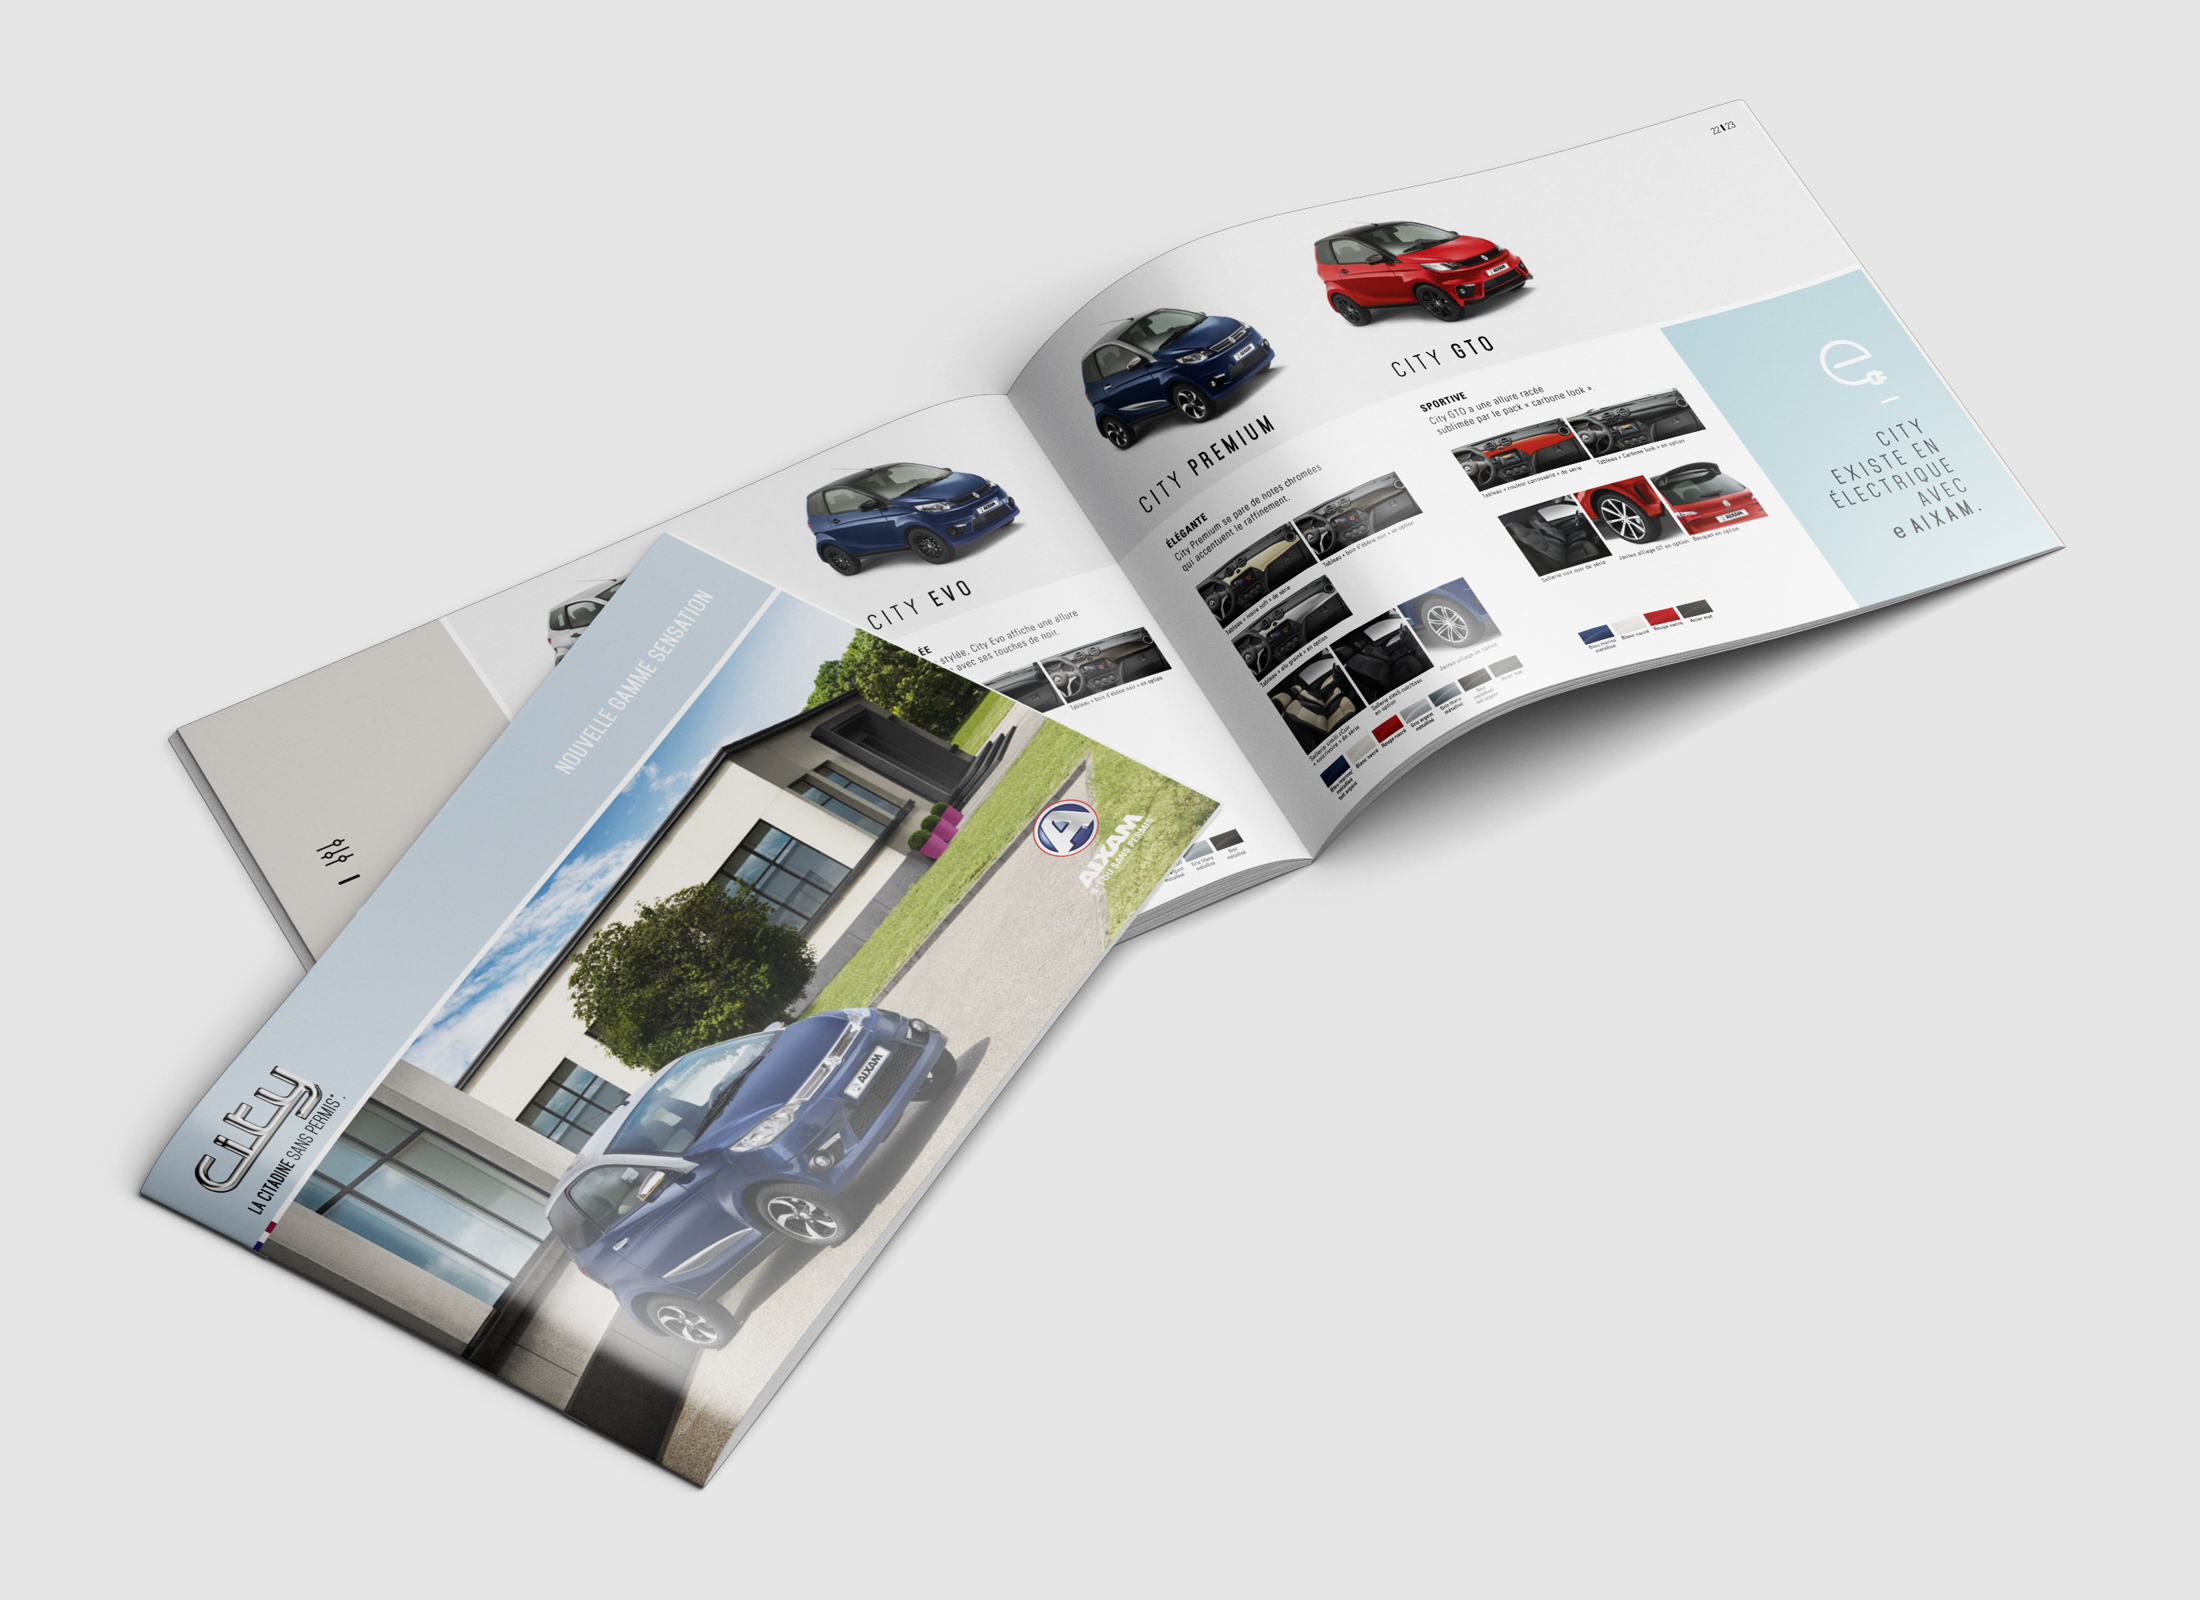 JEN02_Web_GalerieCommunication_Aixam Brochure_03